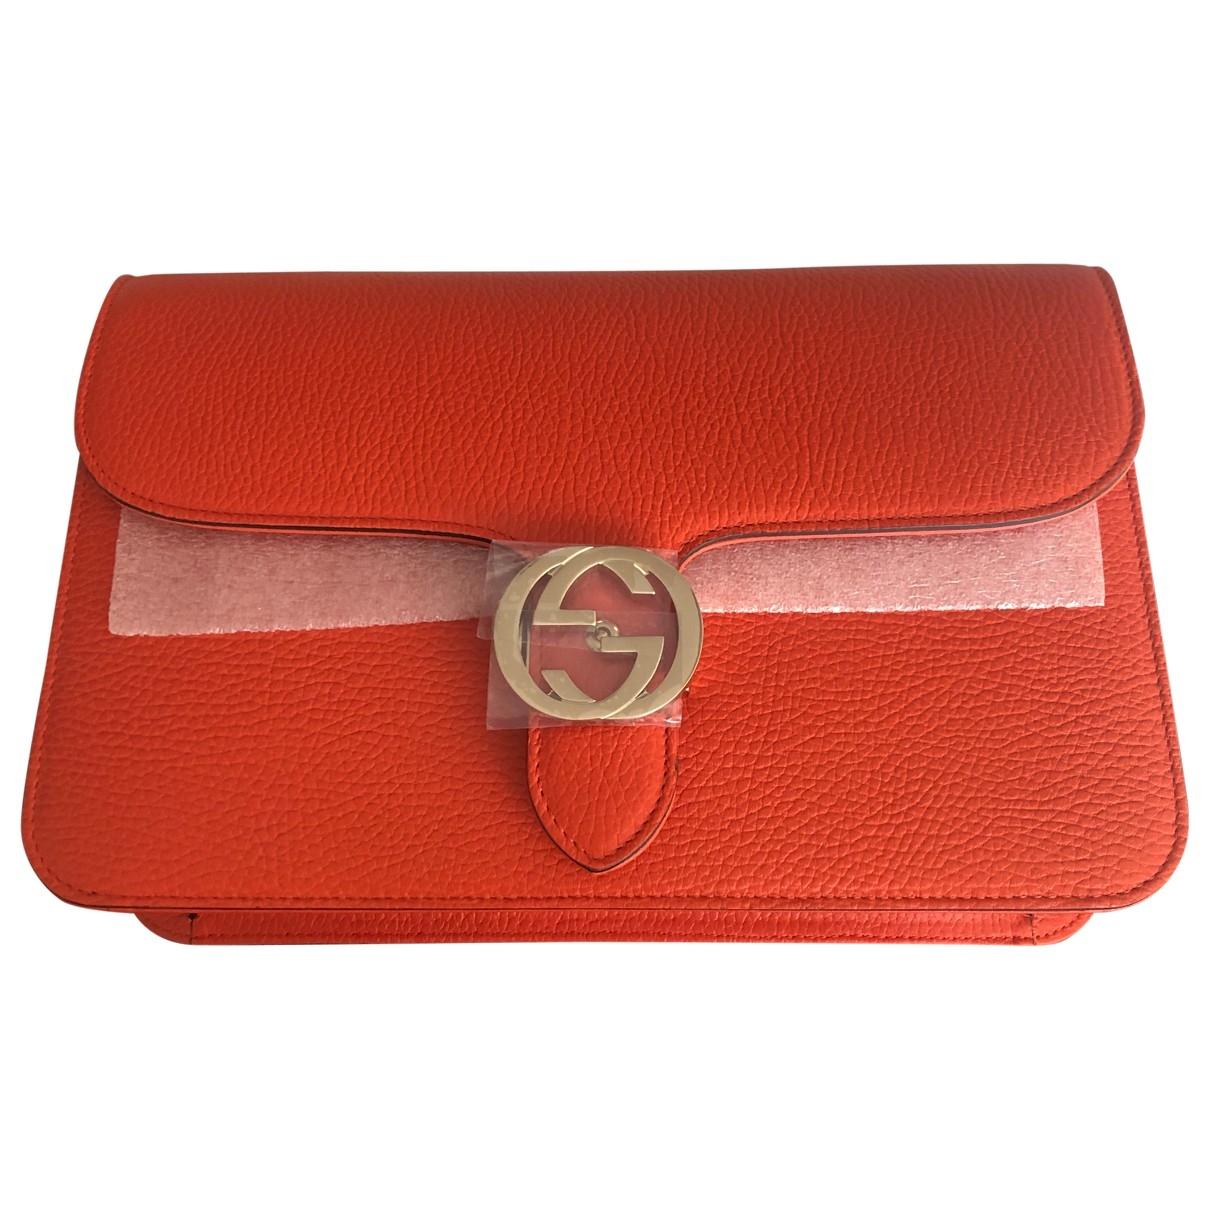 Bolso  Interlocking de Cuero Gucci